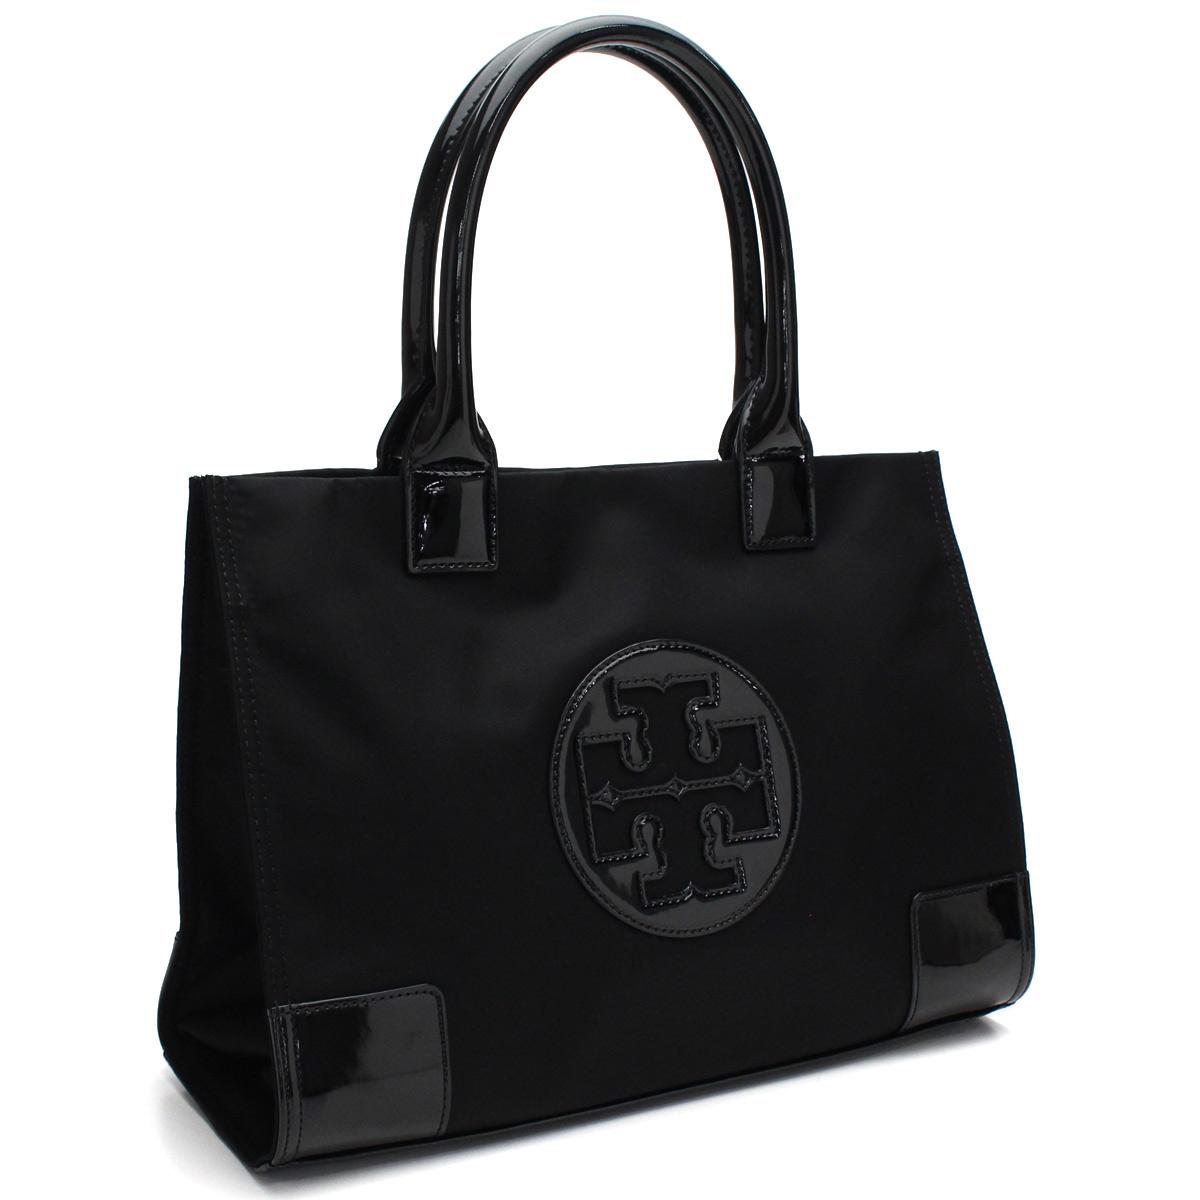 de17e8b8625 Bighit The total brand wholesale: Tolly Birch (TORY BURCH) nylon mini-gills  Thoth [NYLON MINI ELLA TOTE] tote bag 50009813 009 BLACK/BLACK black |  Rakuten ...